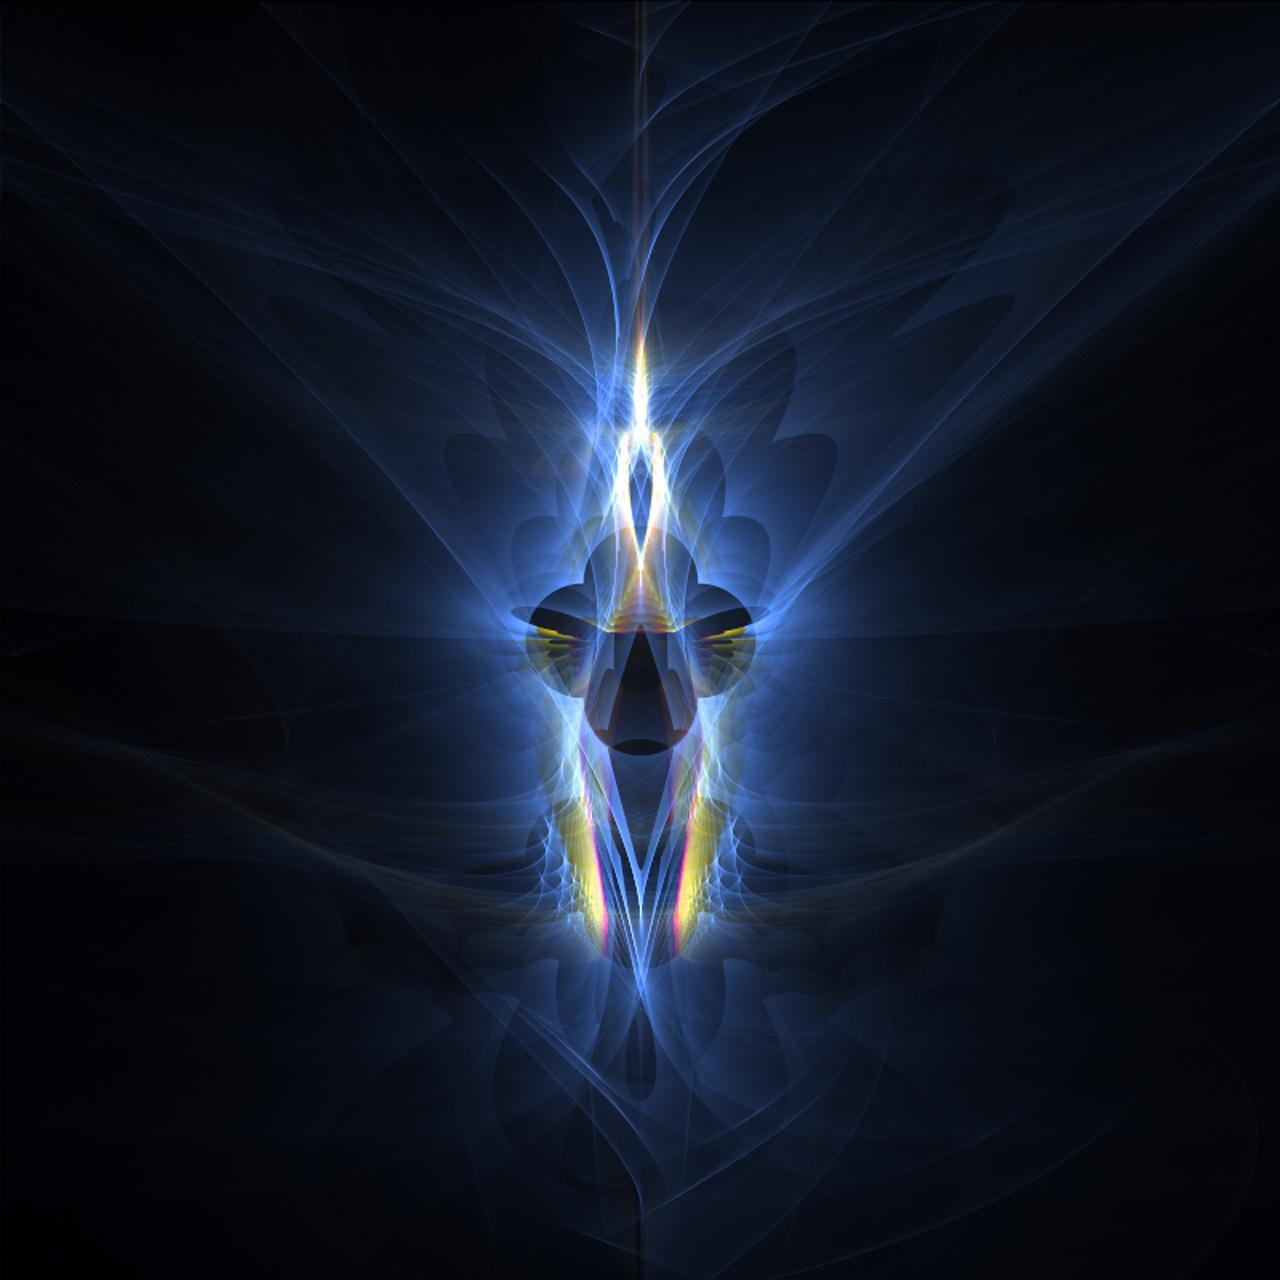 software_buddhabrot_image31